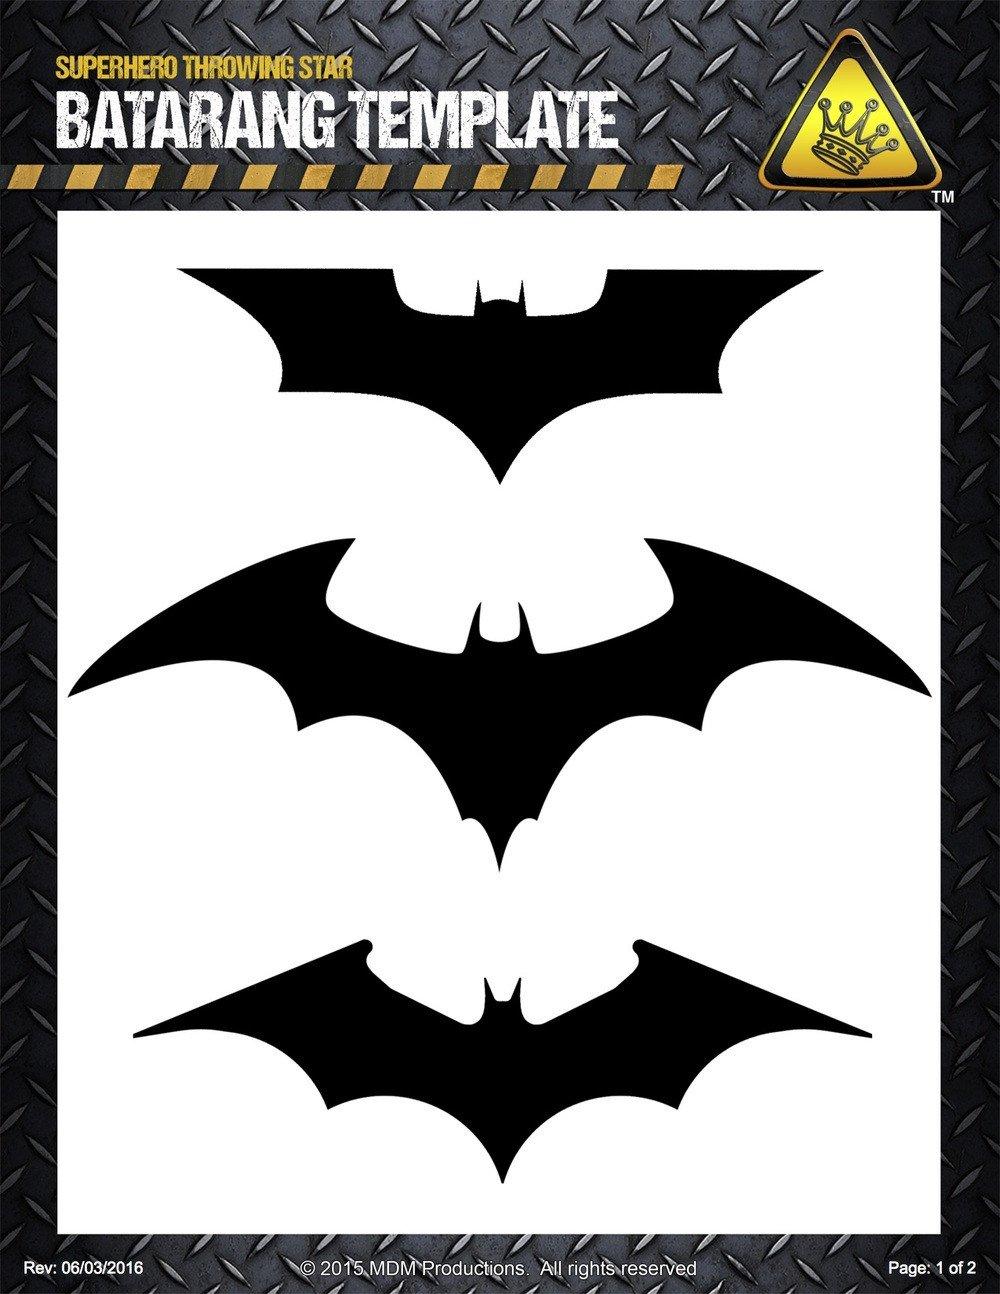 Batarang Template Pdf Project Pdfs — the King Of Random